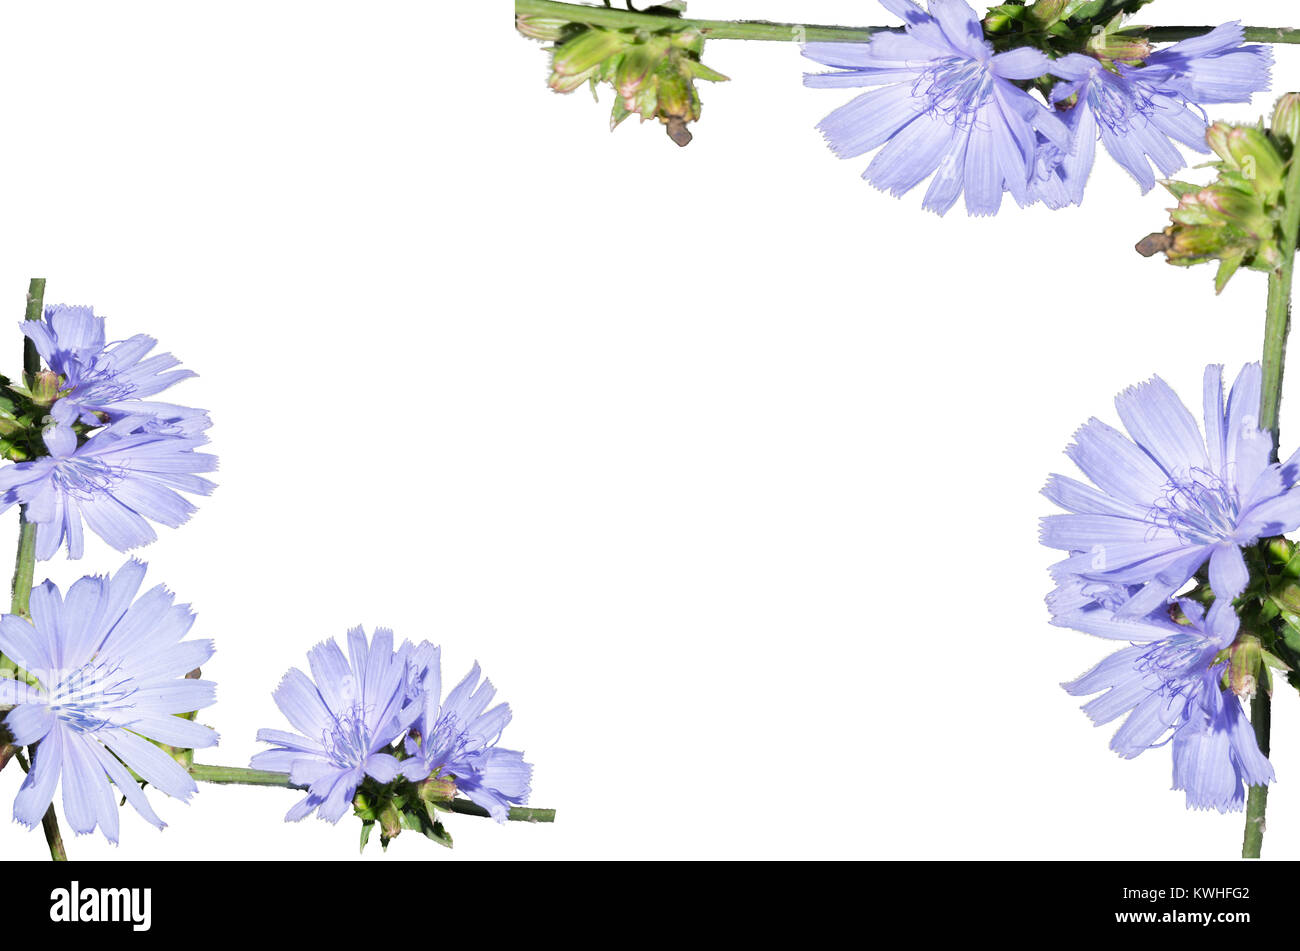 Arreglos De Flores Azul Claro Aislado En Un Fondo Blanco Closeup